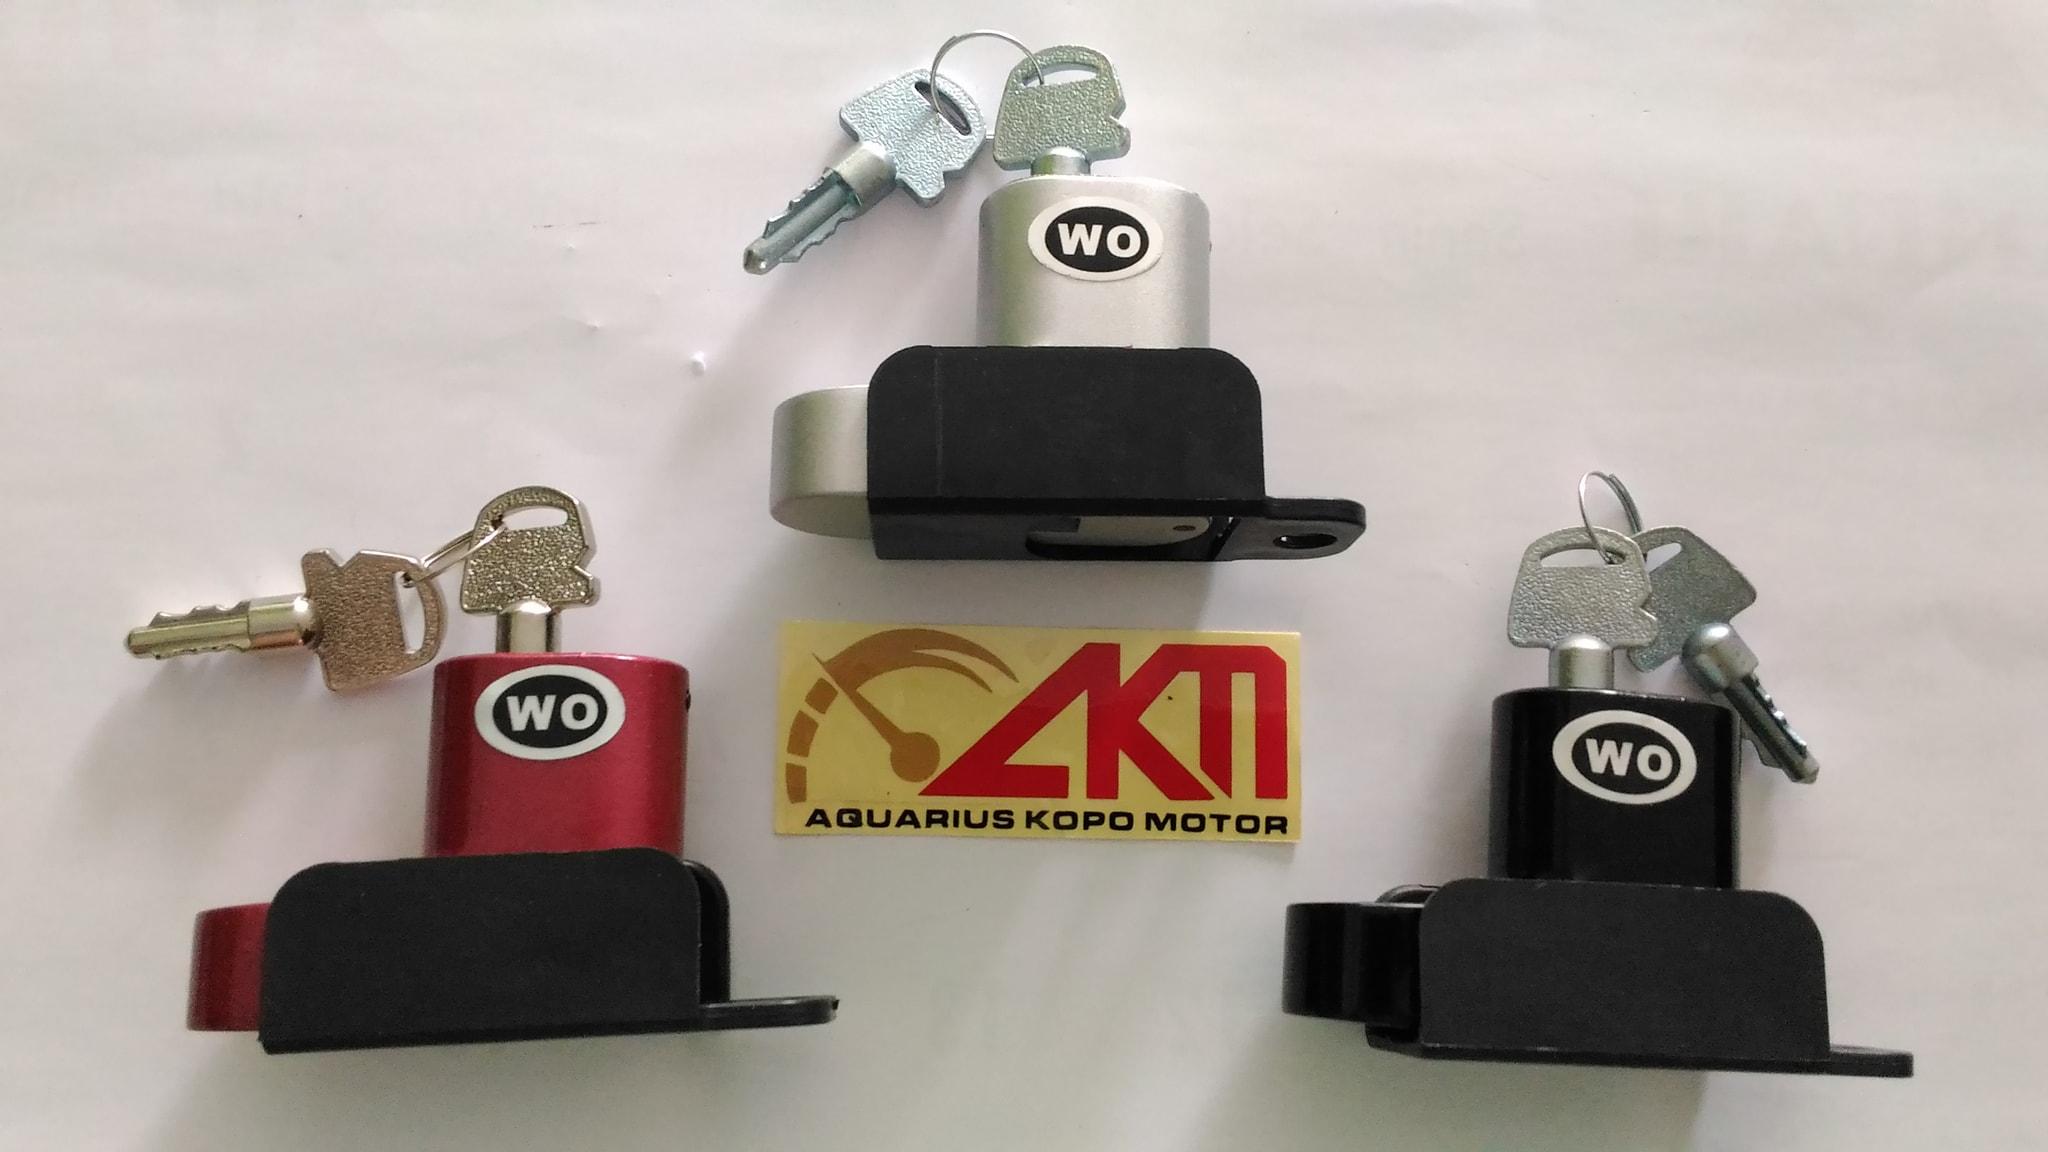 Kunci Cakram WO / Gembok Cakram Motor Dengan Tempat Dudukan Universal